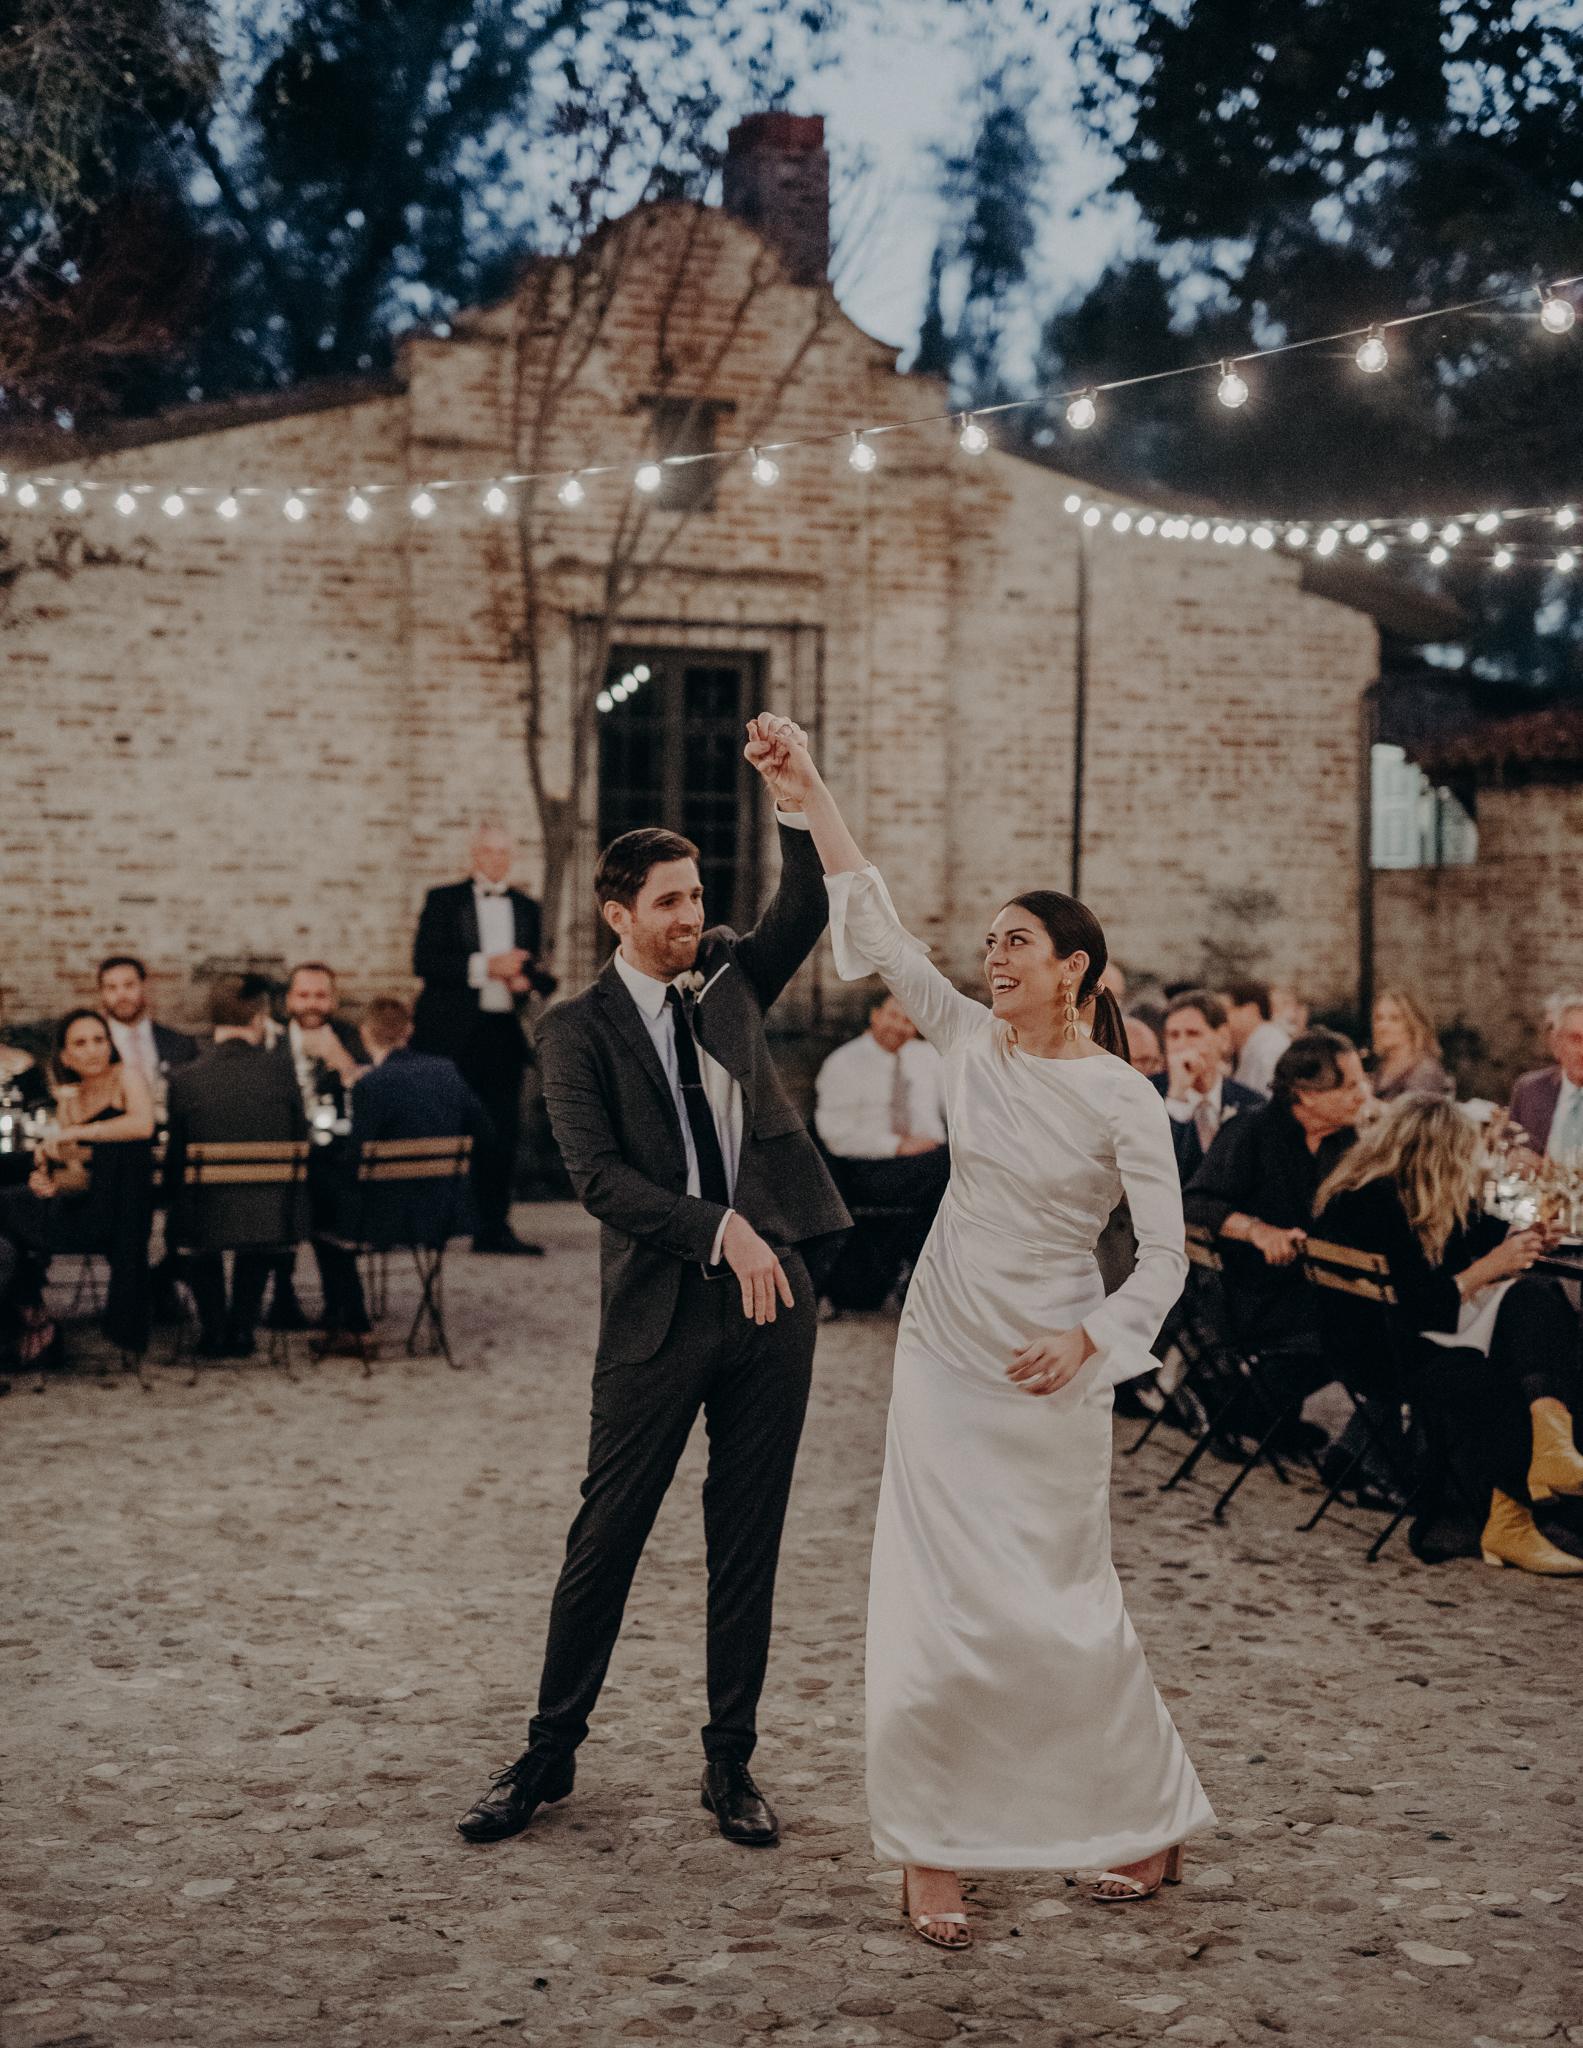 Hummingbird Nest Ranch Wedding - Wedding Photographer in Los Angeles - IsaiahAndTaylor.com-090.jpg